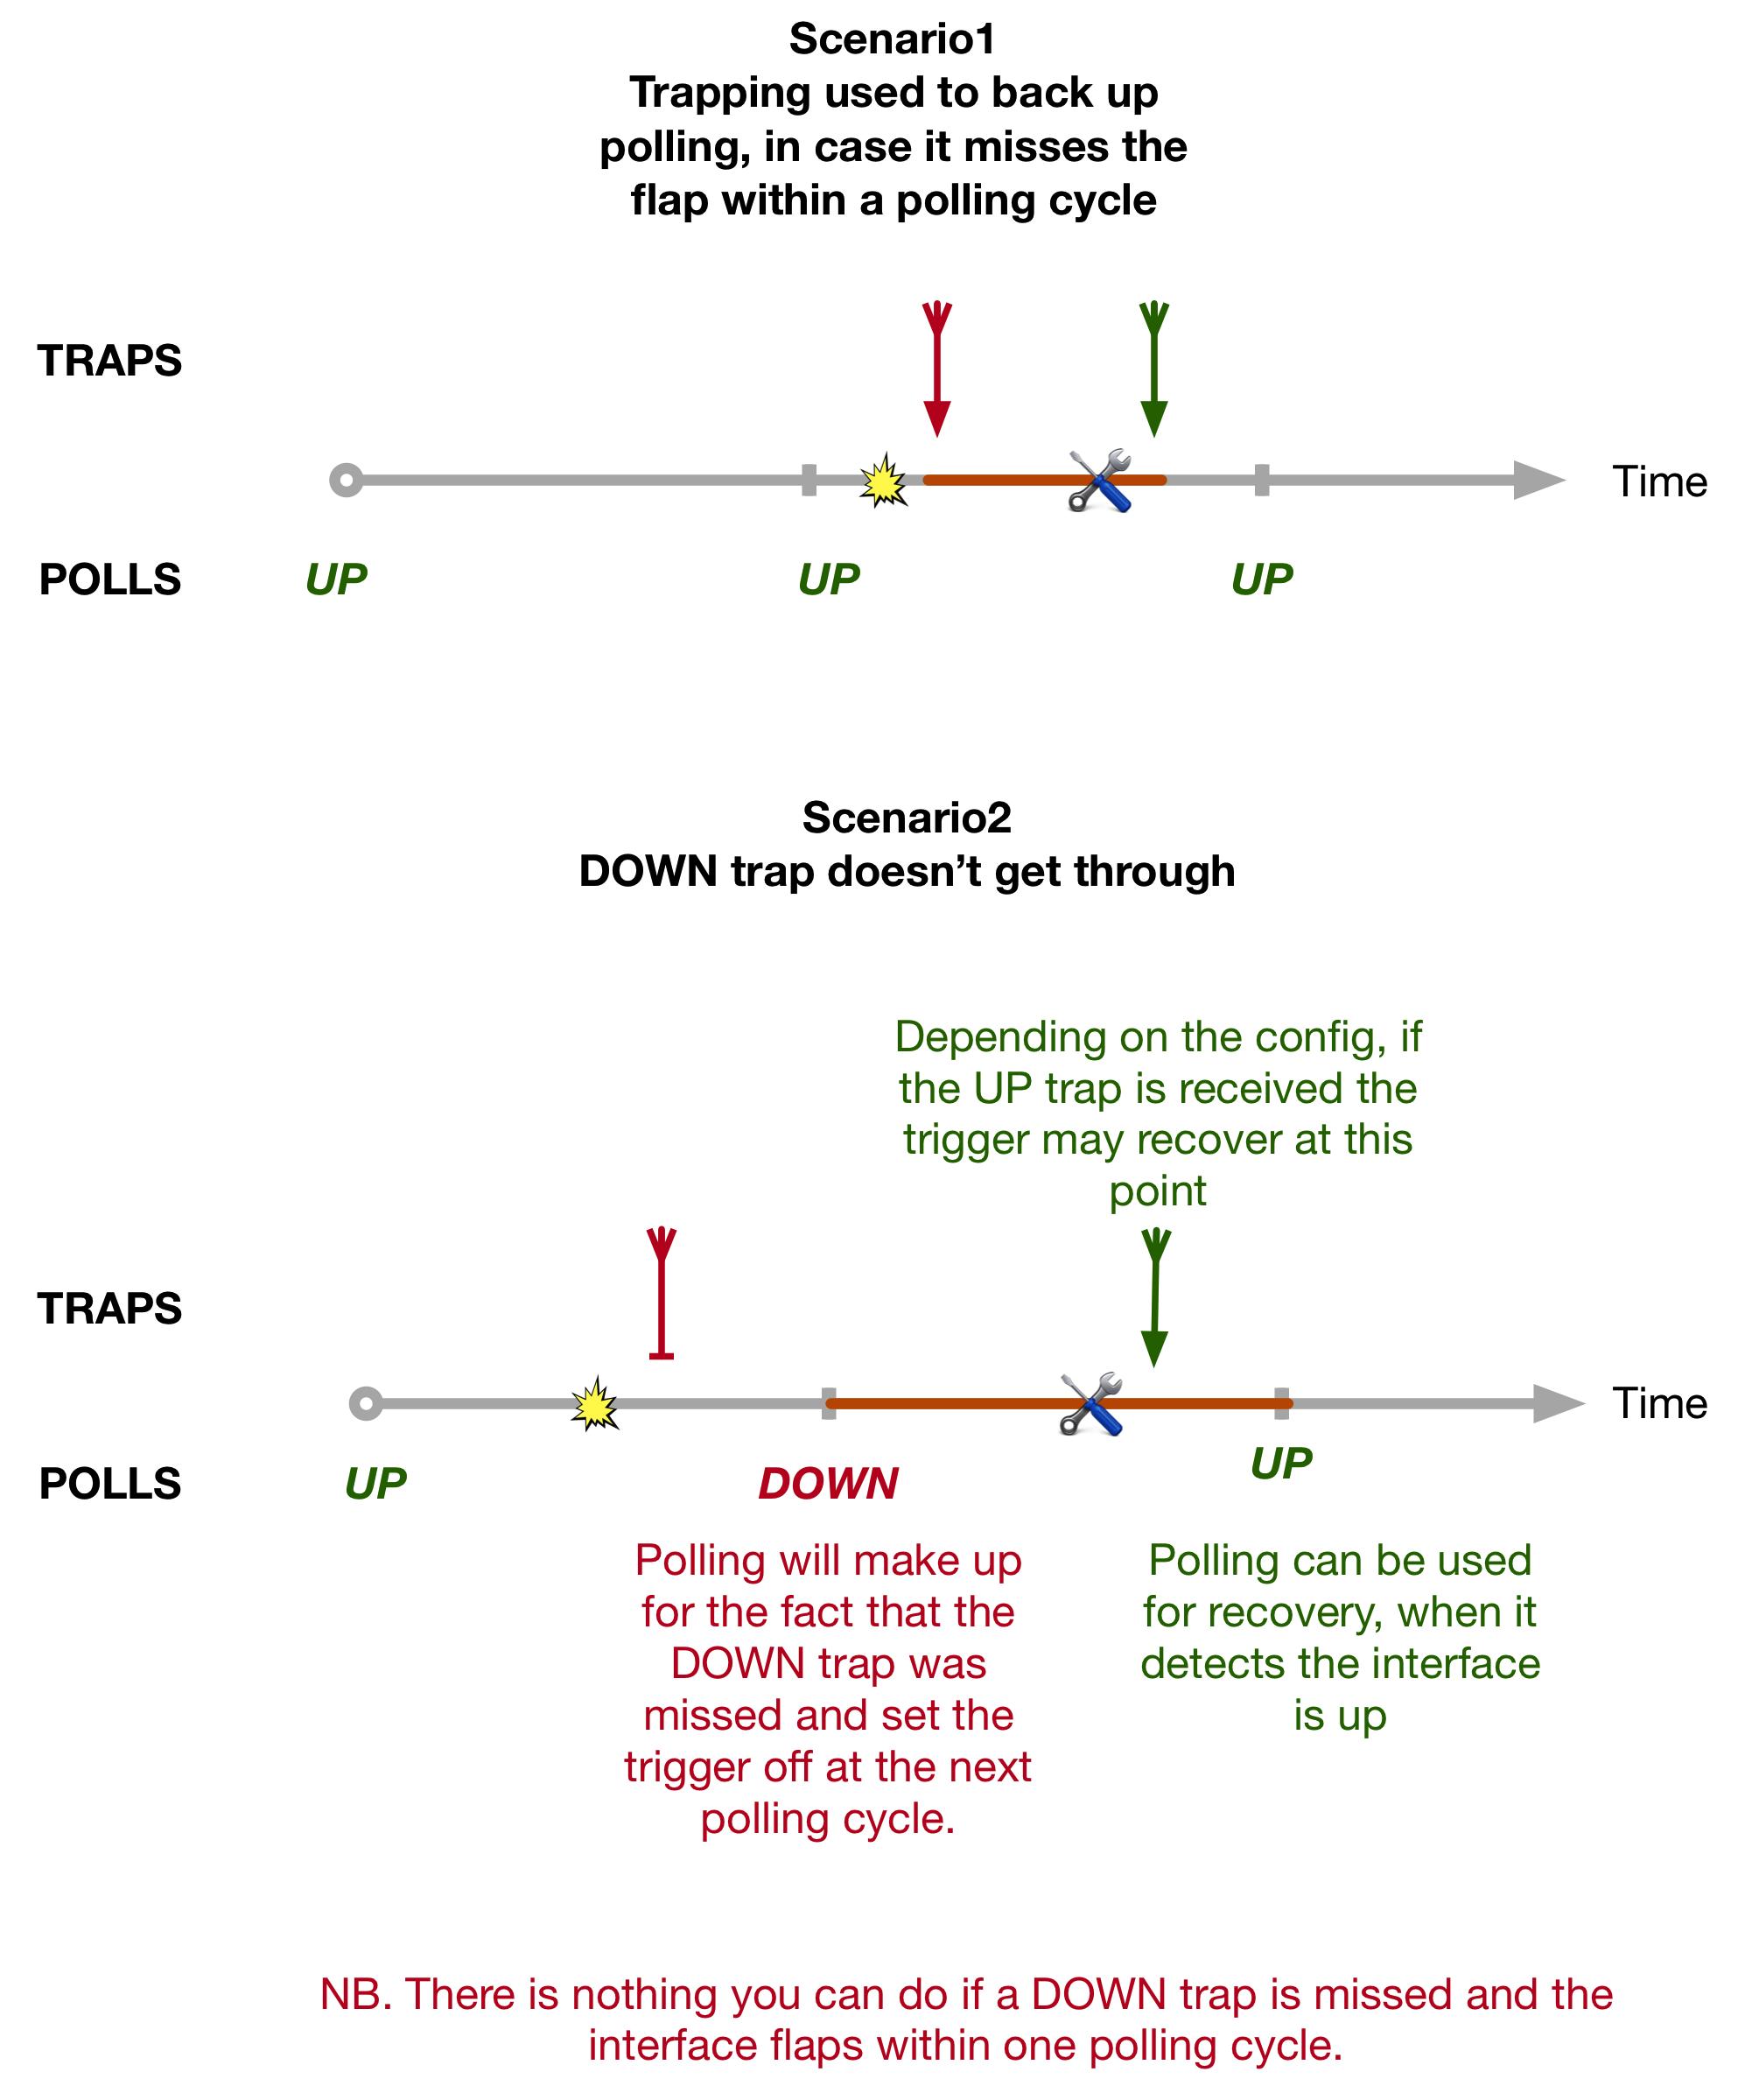 blog8_image8_diagram3